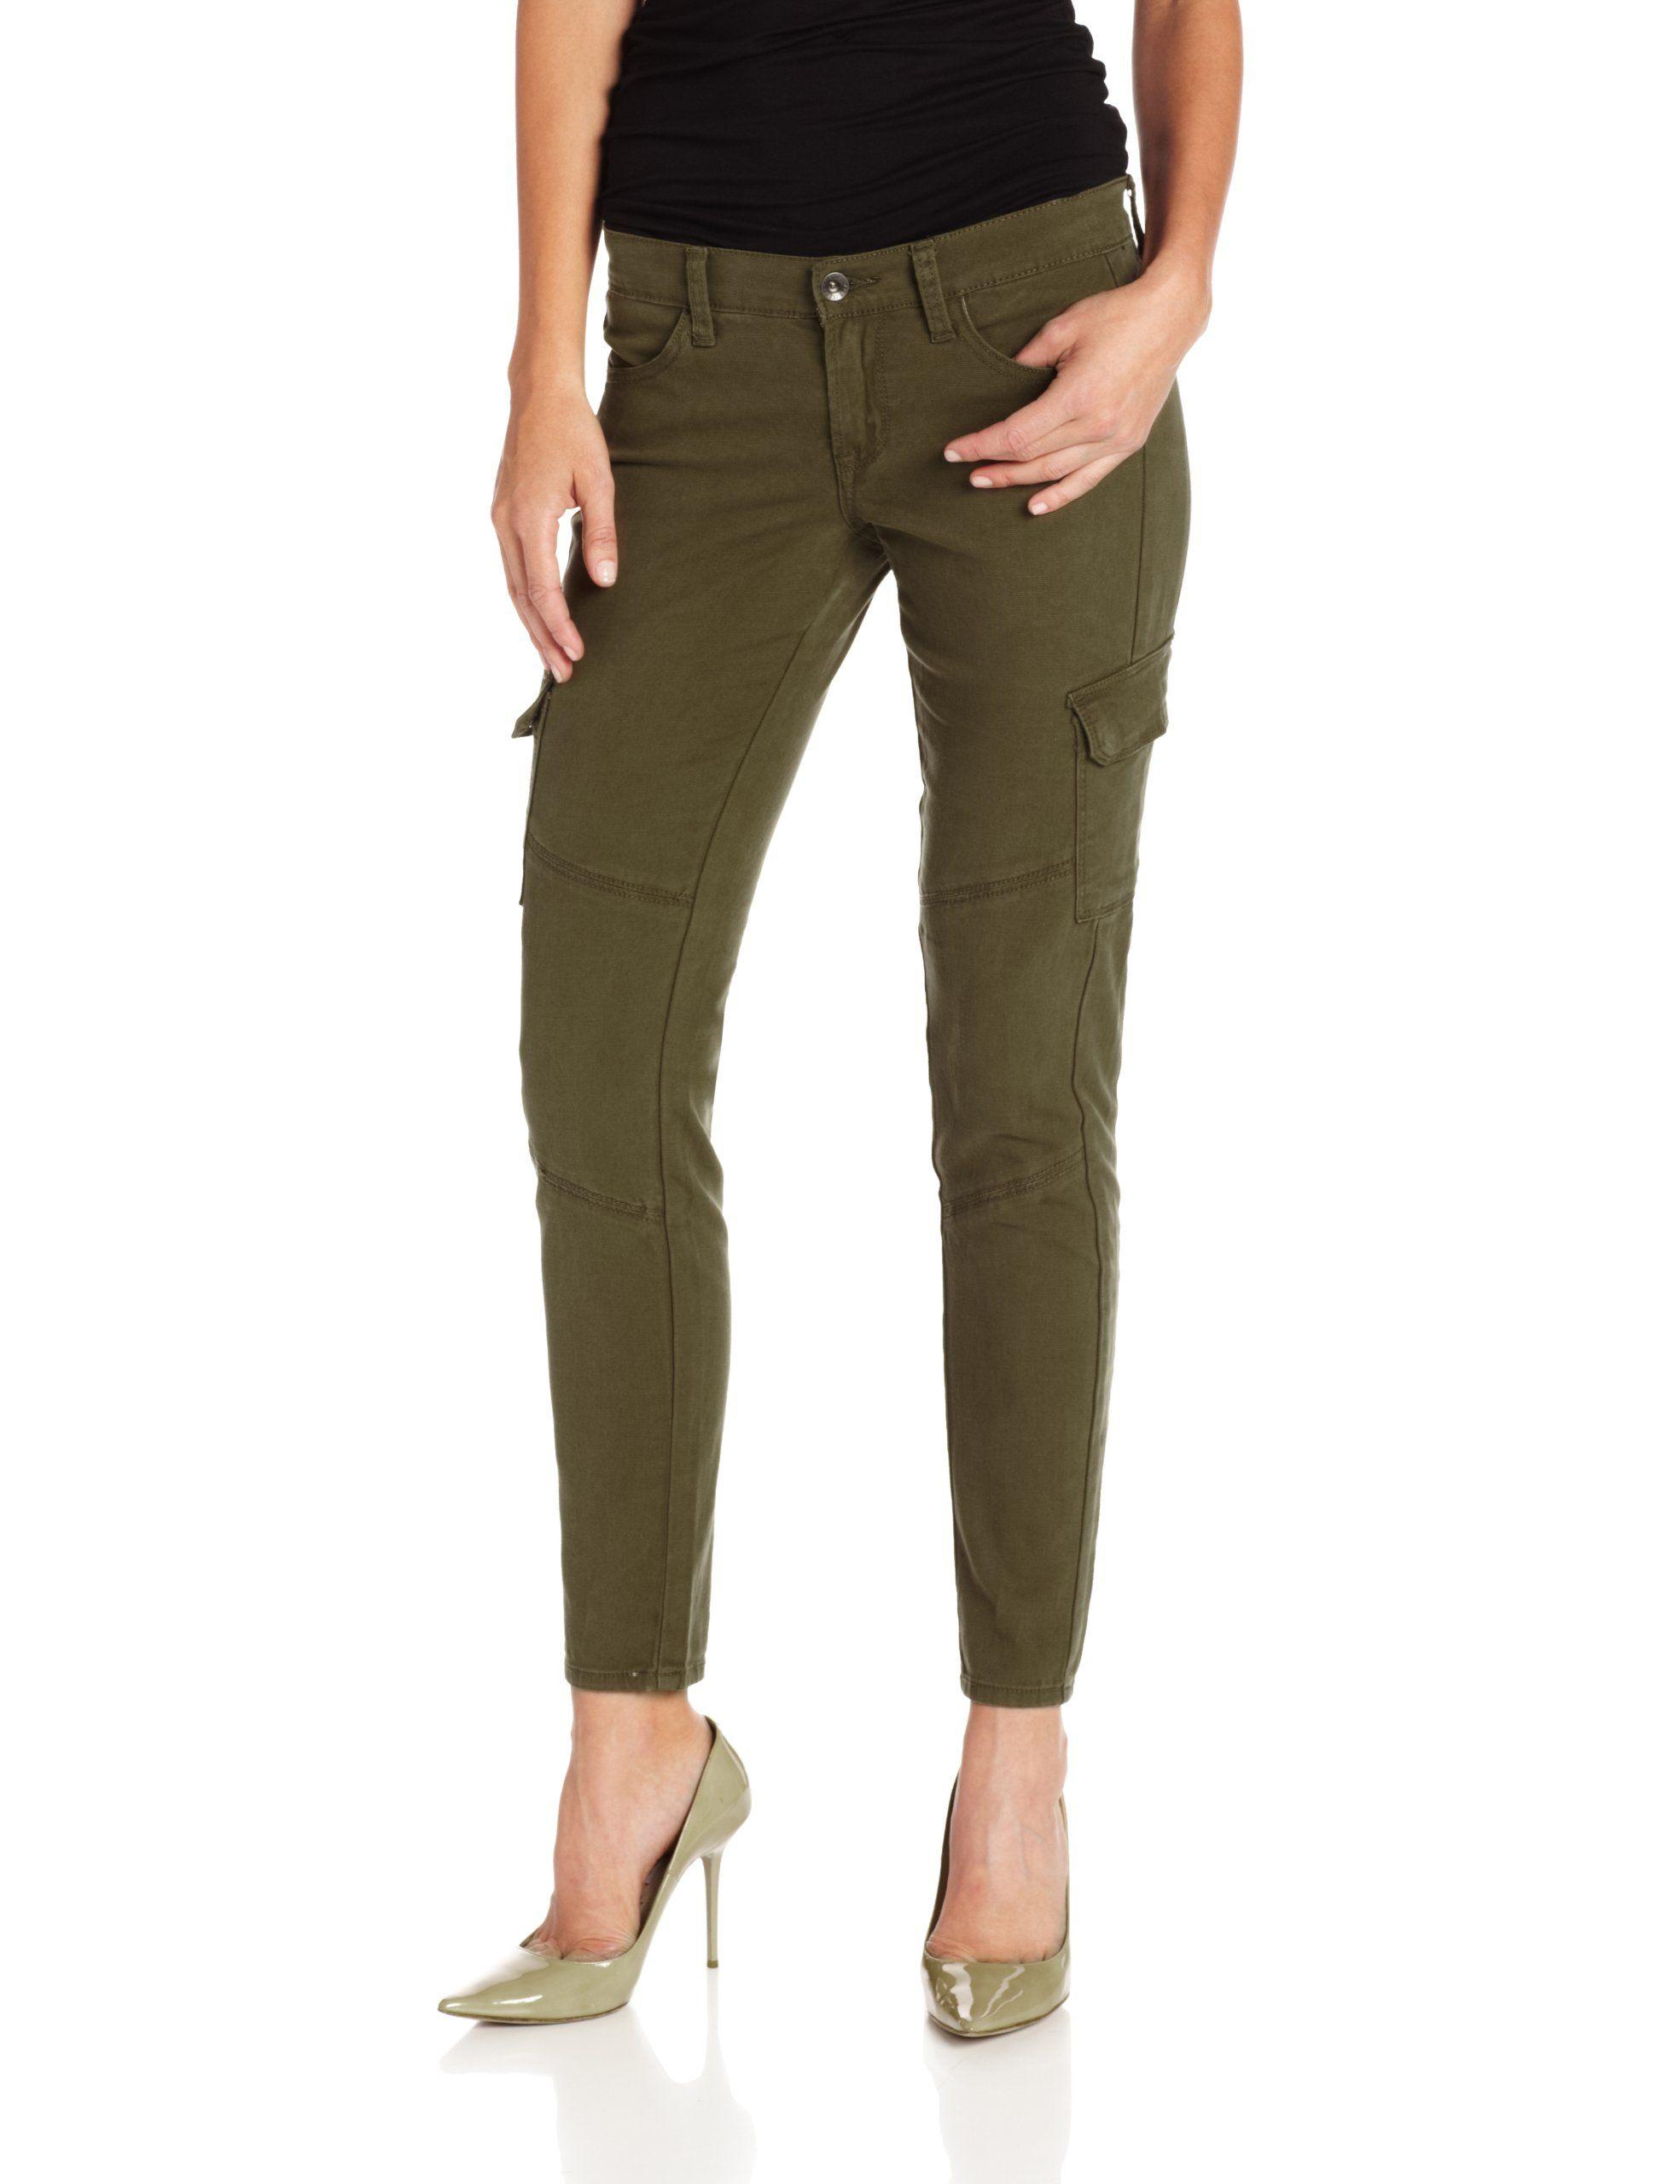 e30114ad99563 Amazon- kim possible cargo pants | Halloween Ideas | Skinny cargo ...